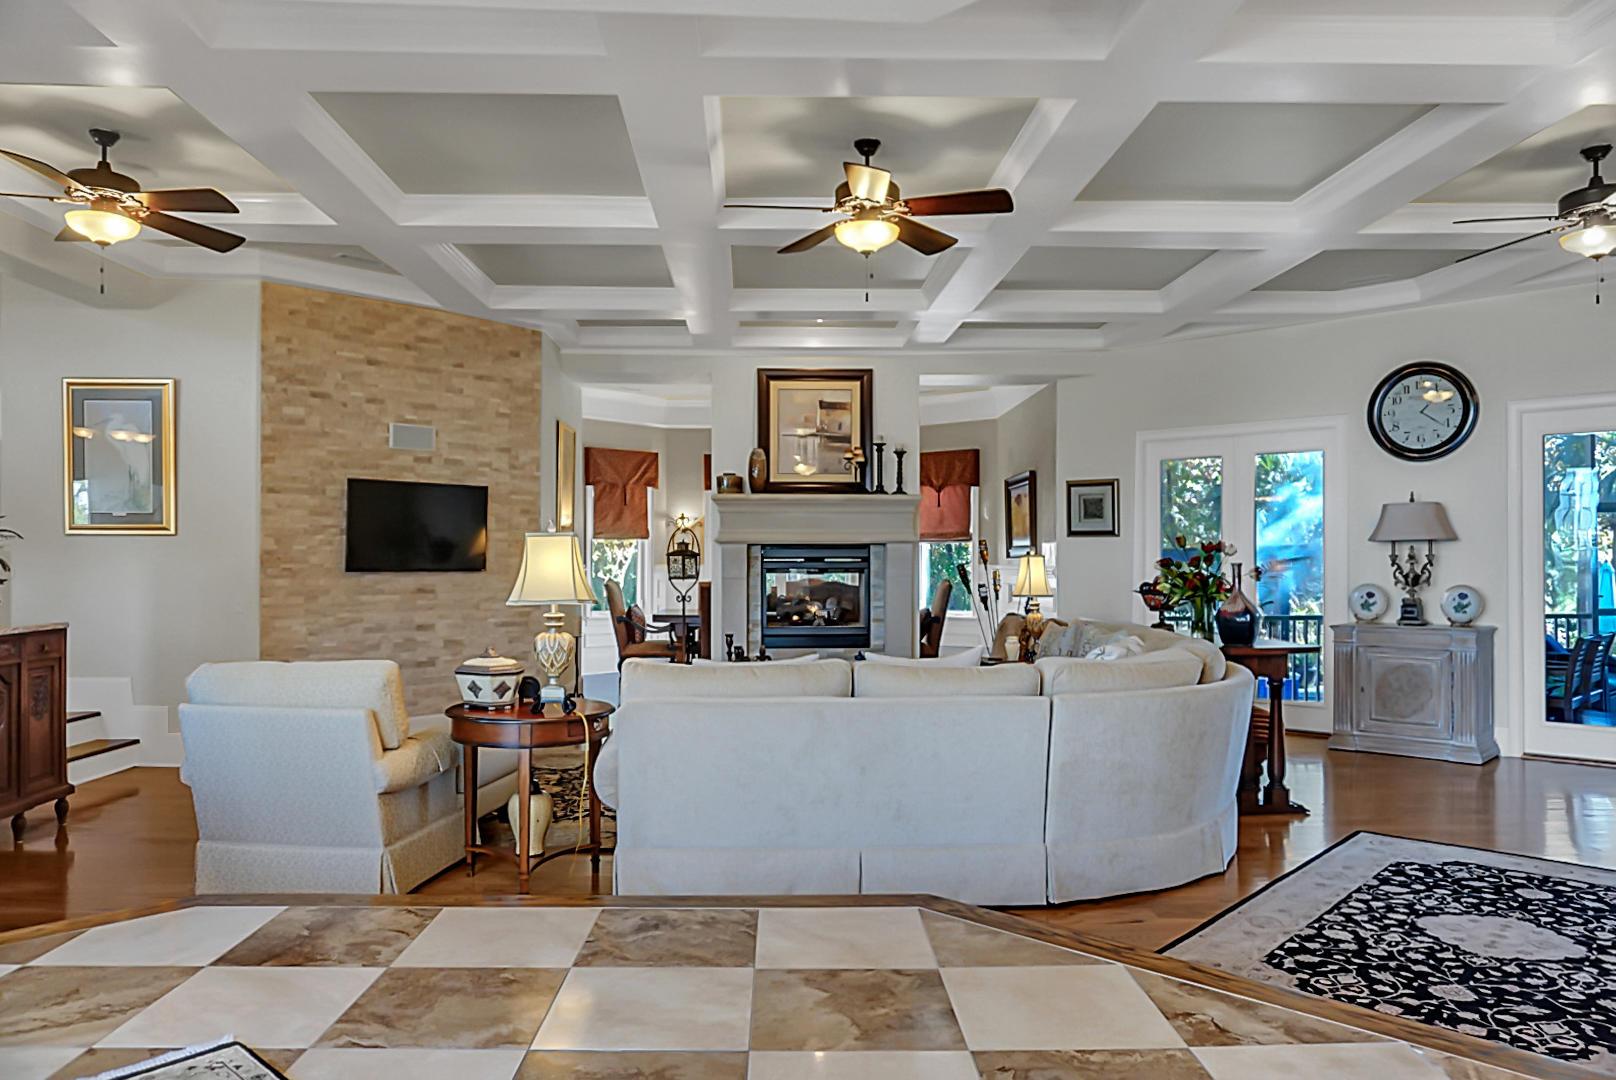 Dunes West Homes For Sale - 2389 Darts Cove, Mount Pleasant, SC - 56